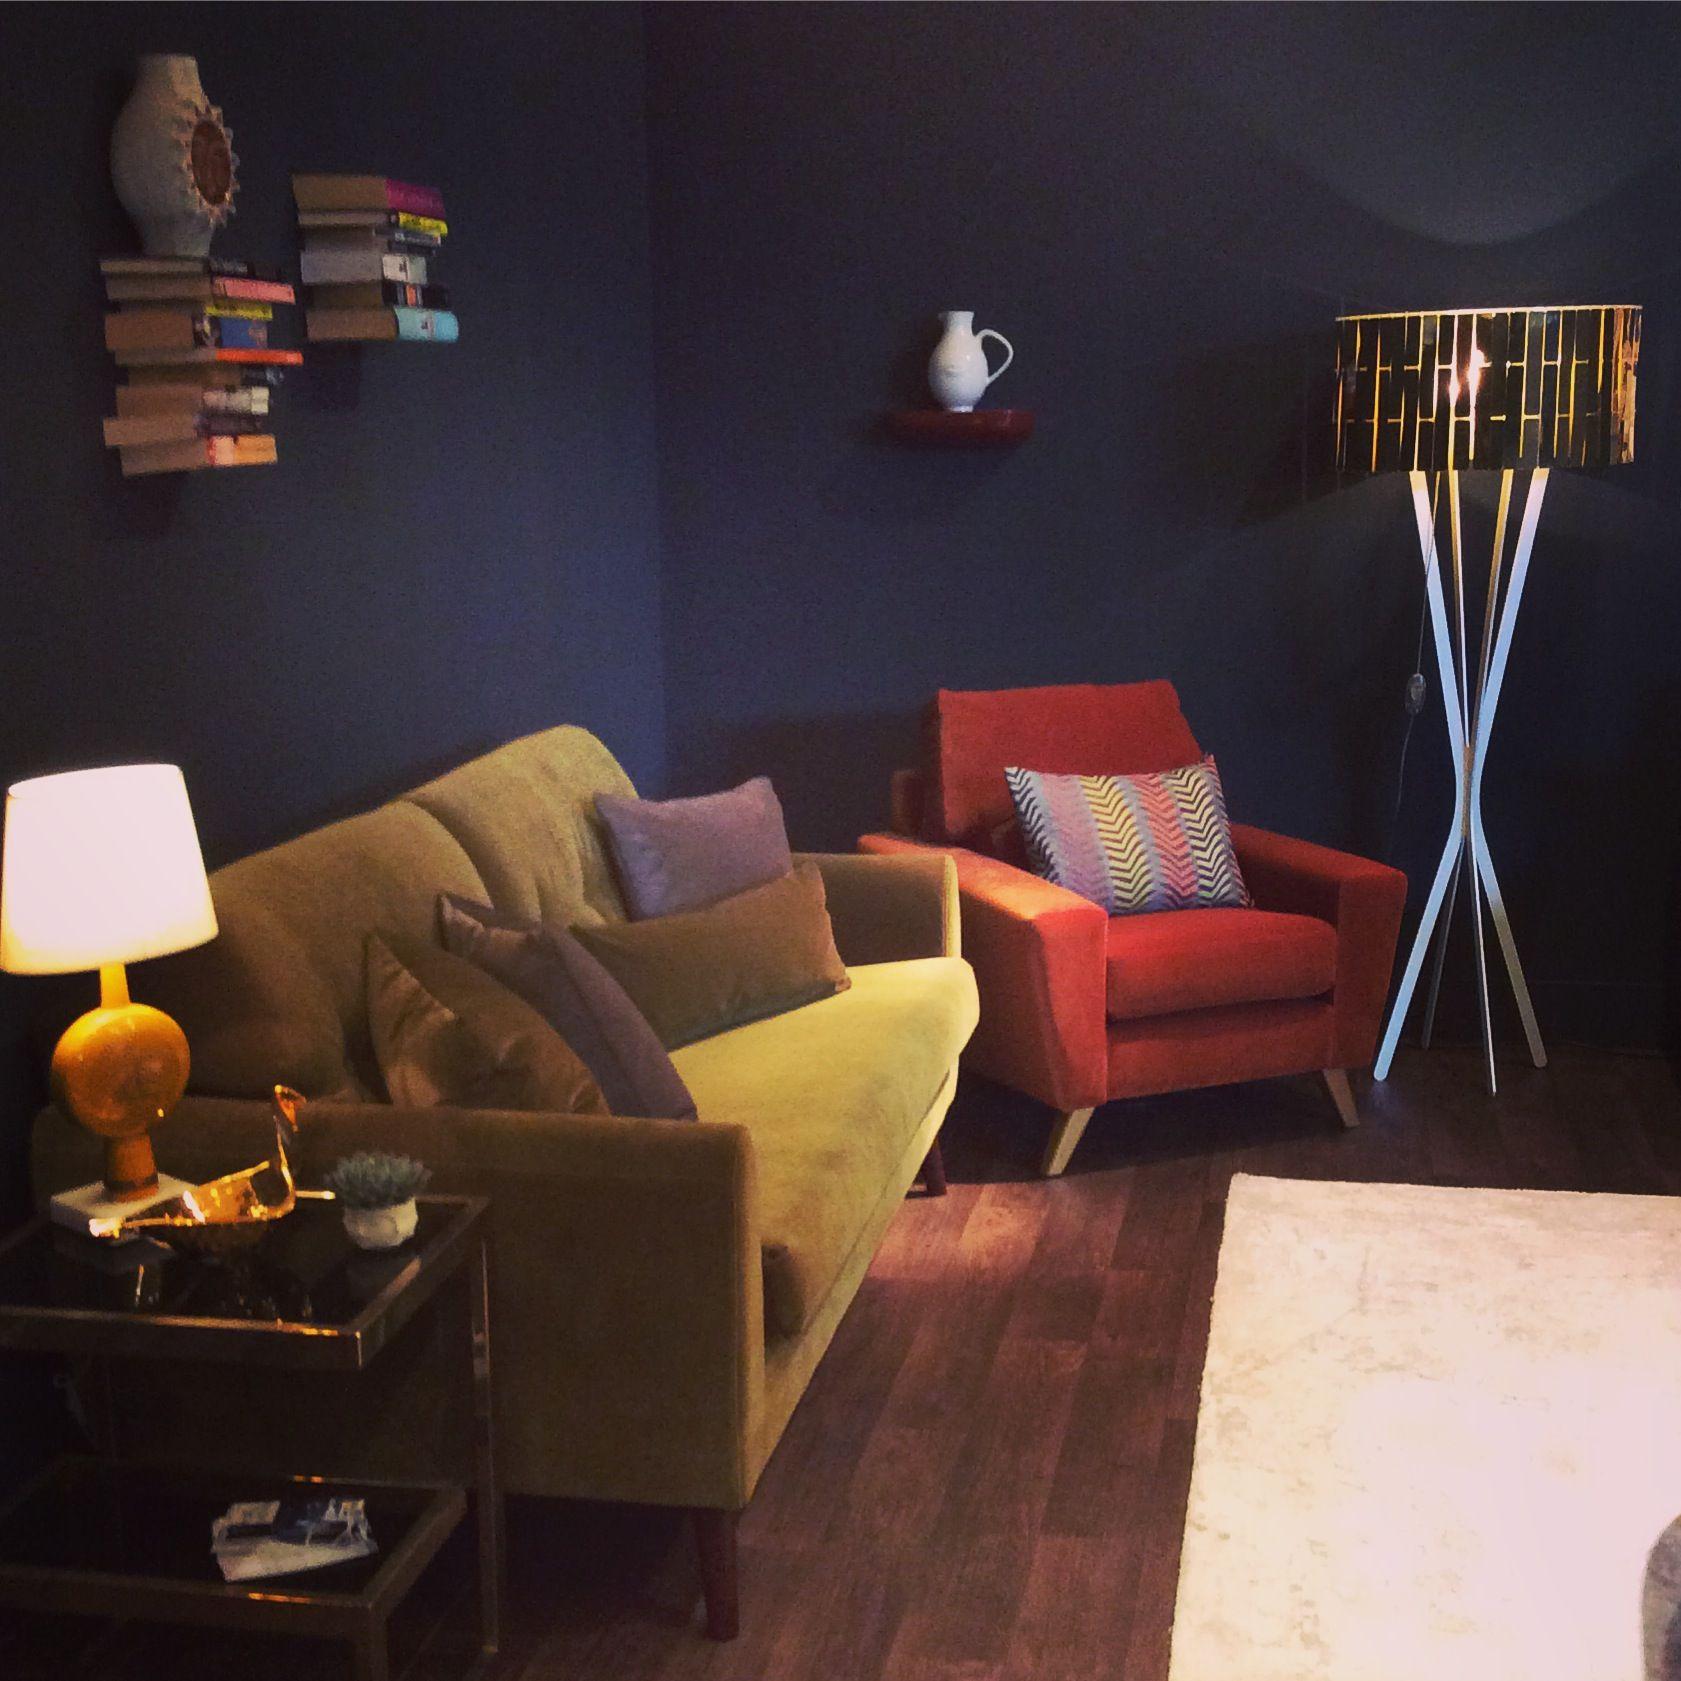 Pin By Abhijay Janu On Homes: The G Plan Vintage Sixty Three Large Sofa In Matt Velvet